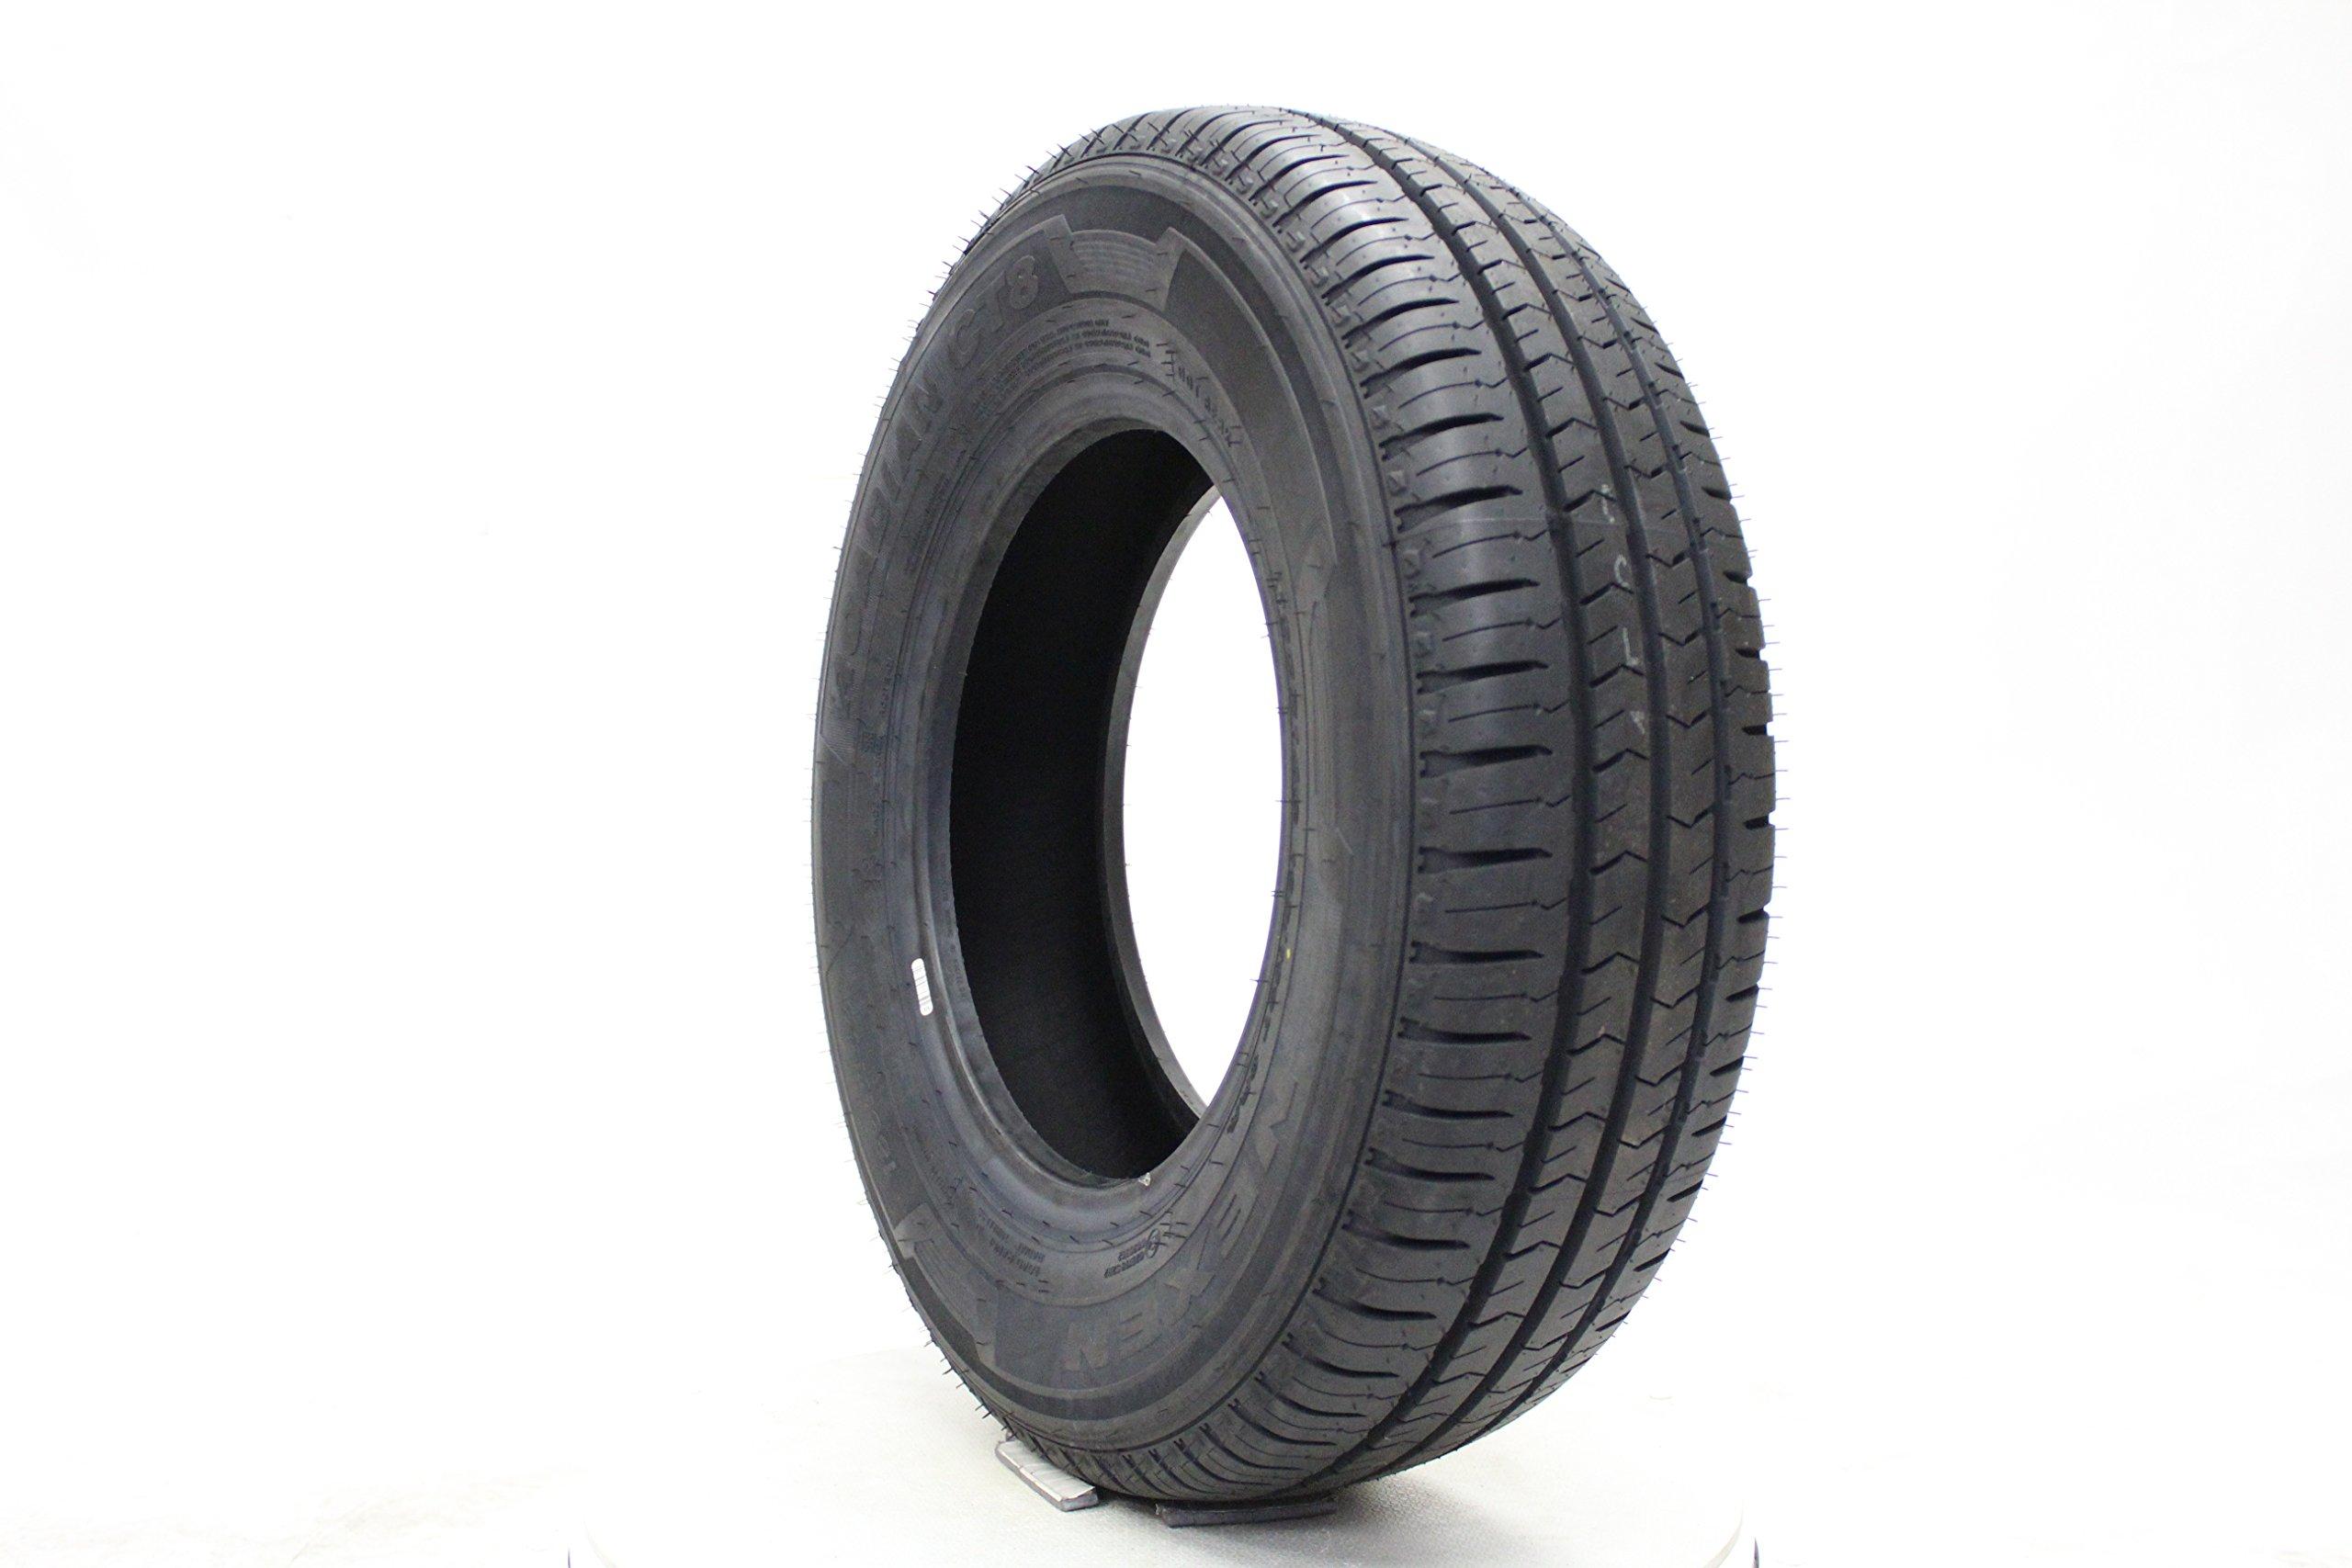 Nexen Roadian CT8 HL Commercial Truck Radial Tire-235/65R16C 119R by NEXEN